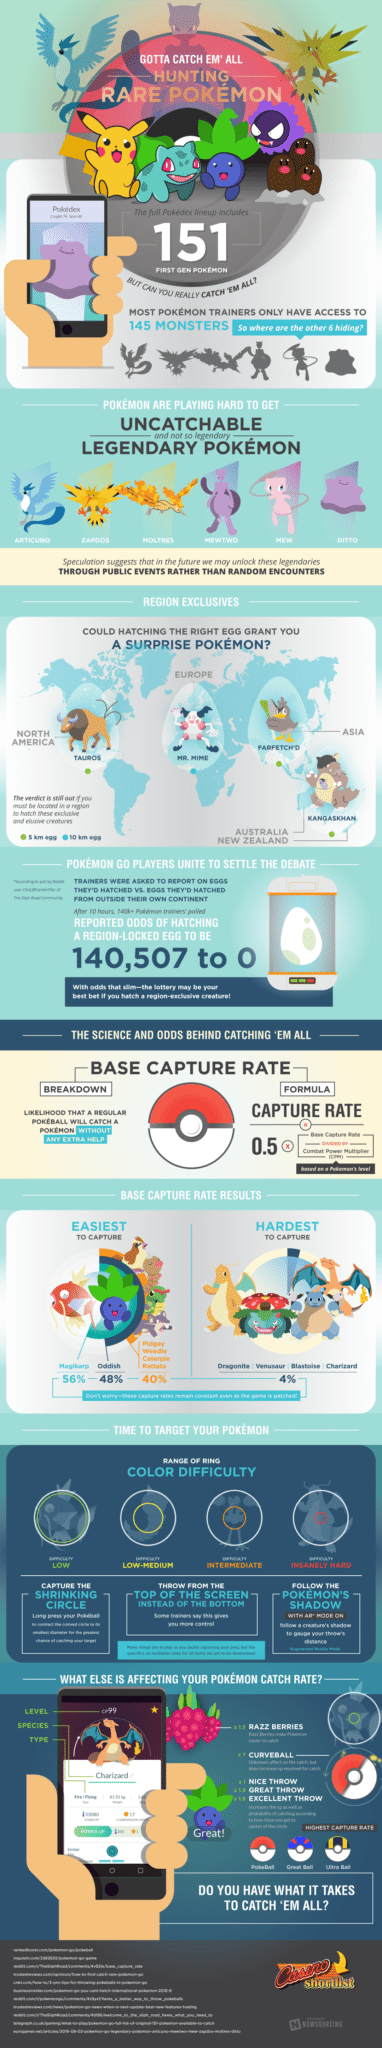 rare-pokemon